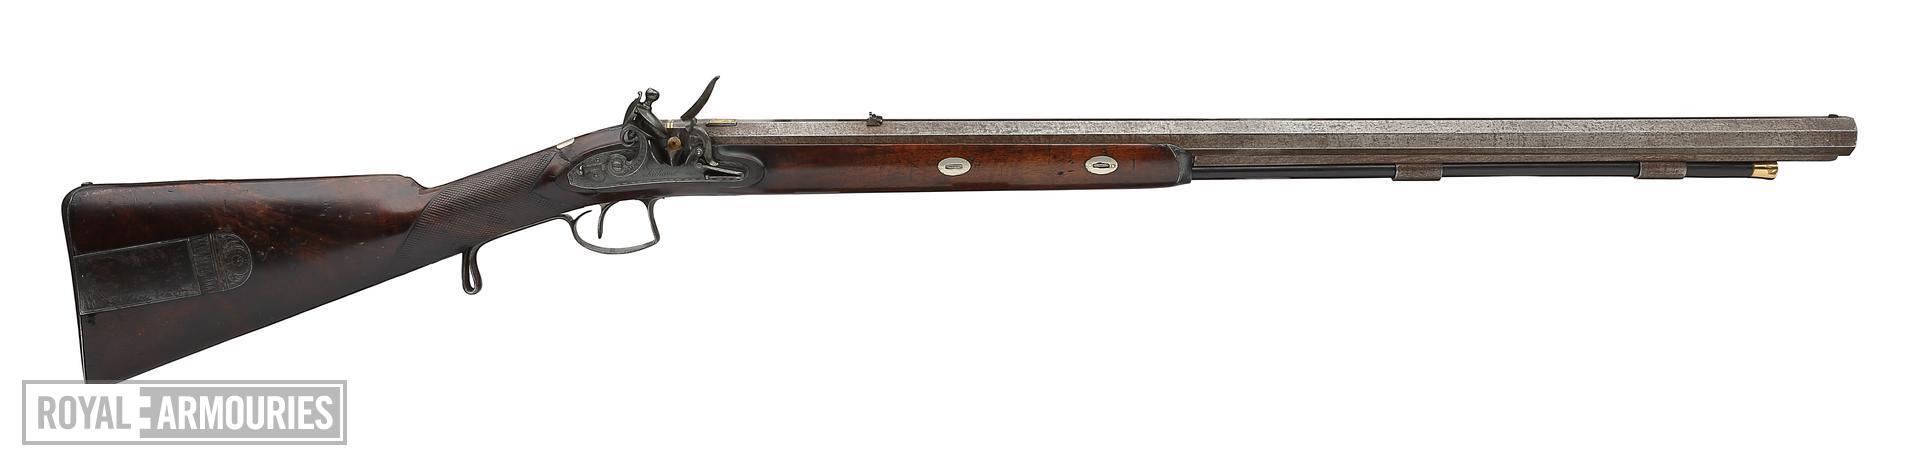 Flintlock muzzle-loading presentation rifle - By Tatham, Sealed Pattern